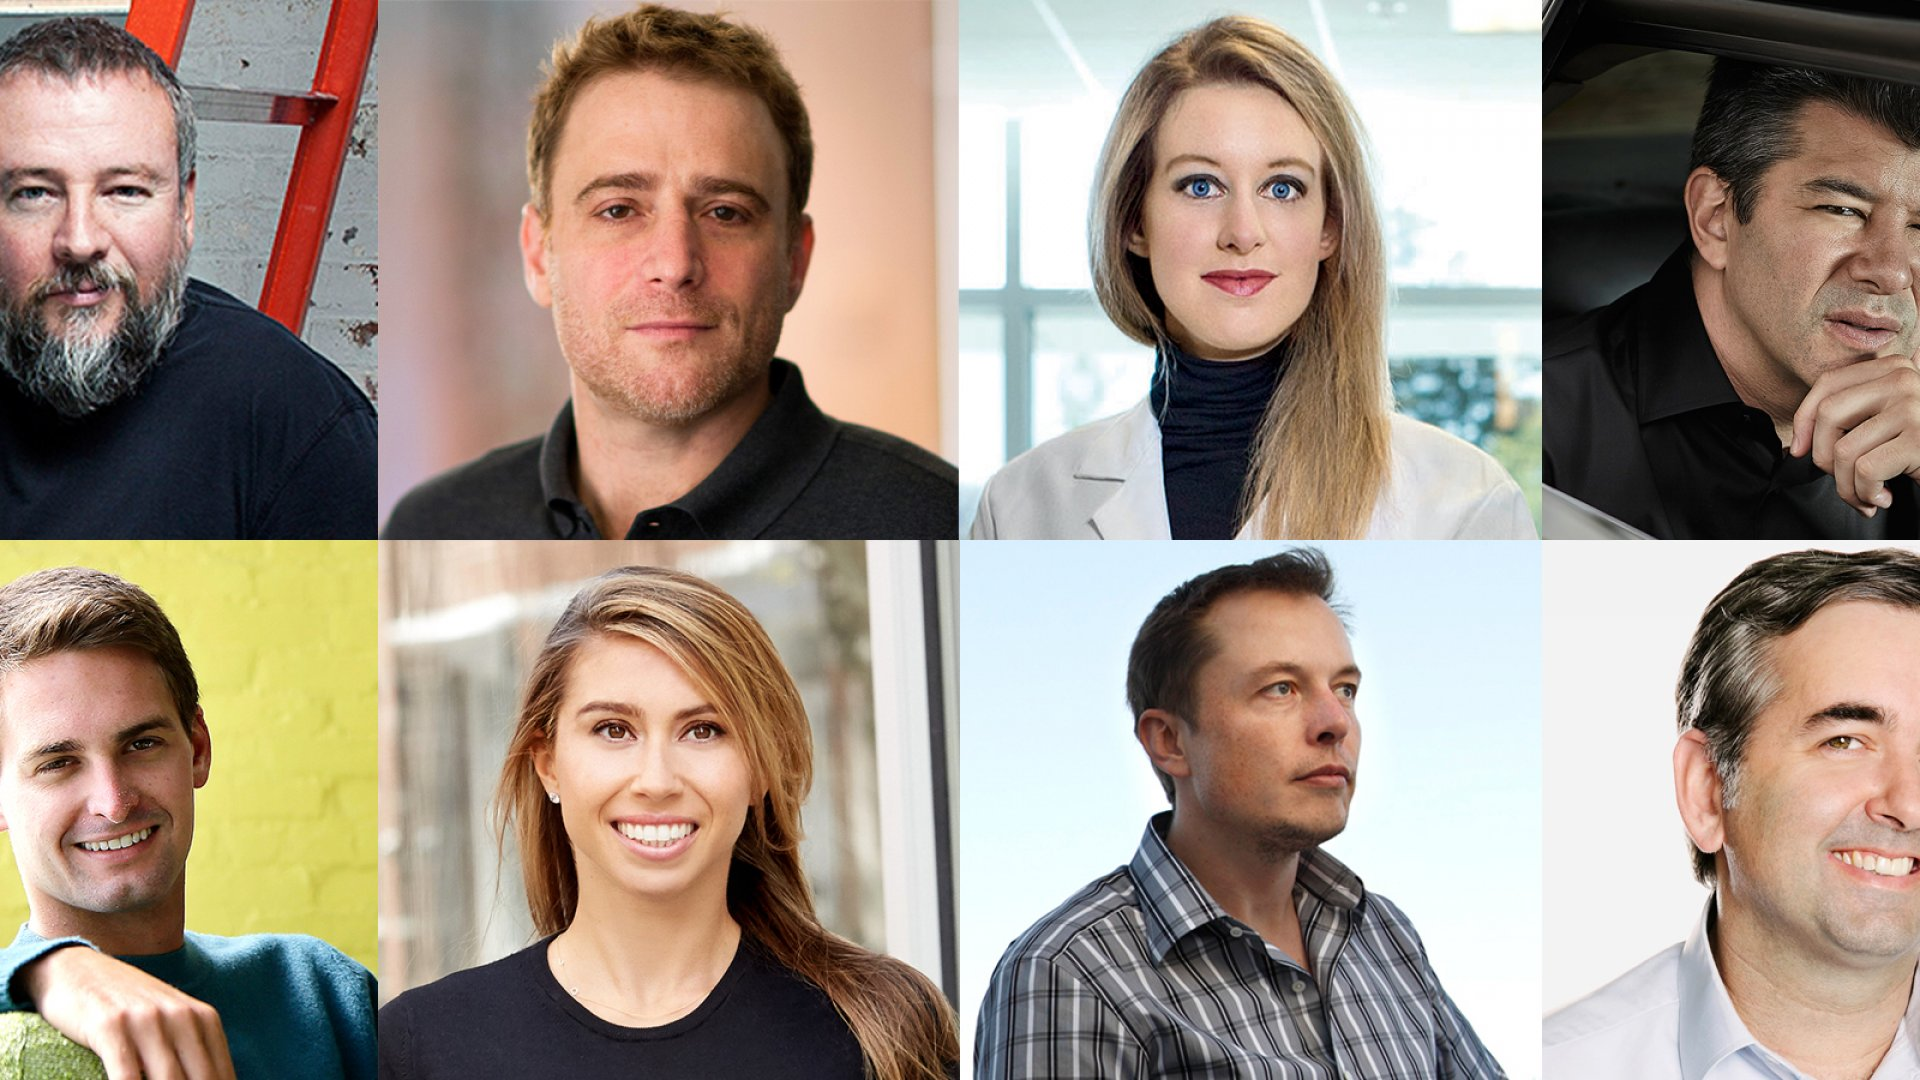 Clockwise from top left: Shane Smith (Vice Media); Stewart Butterfield (Slack); Elizabeth Holmes (Theranos); Travis Kalanick (Uber); Evan Spiegel (Snapchat); Jennifer Fleiss (Rent the Runway); Elon Musk; Chad Dickerson (Etsy)